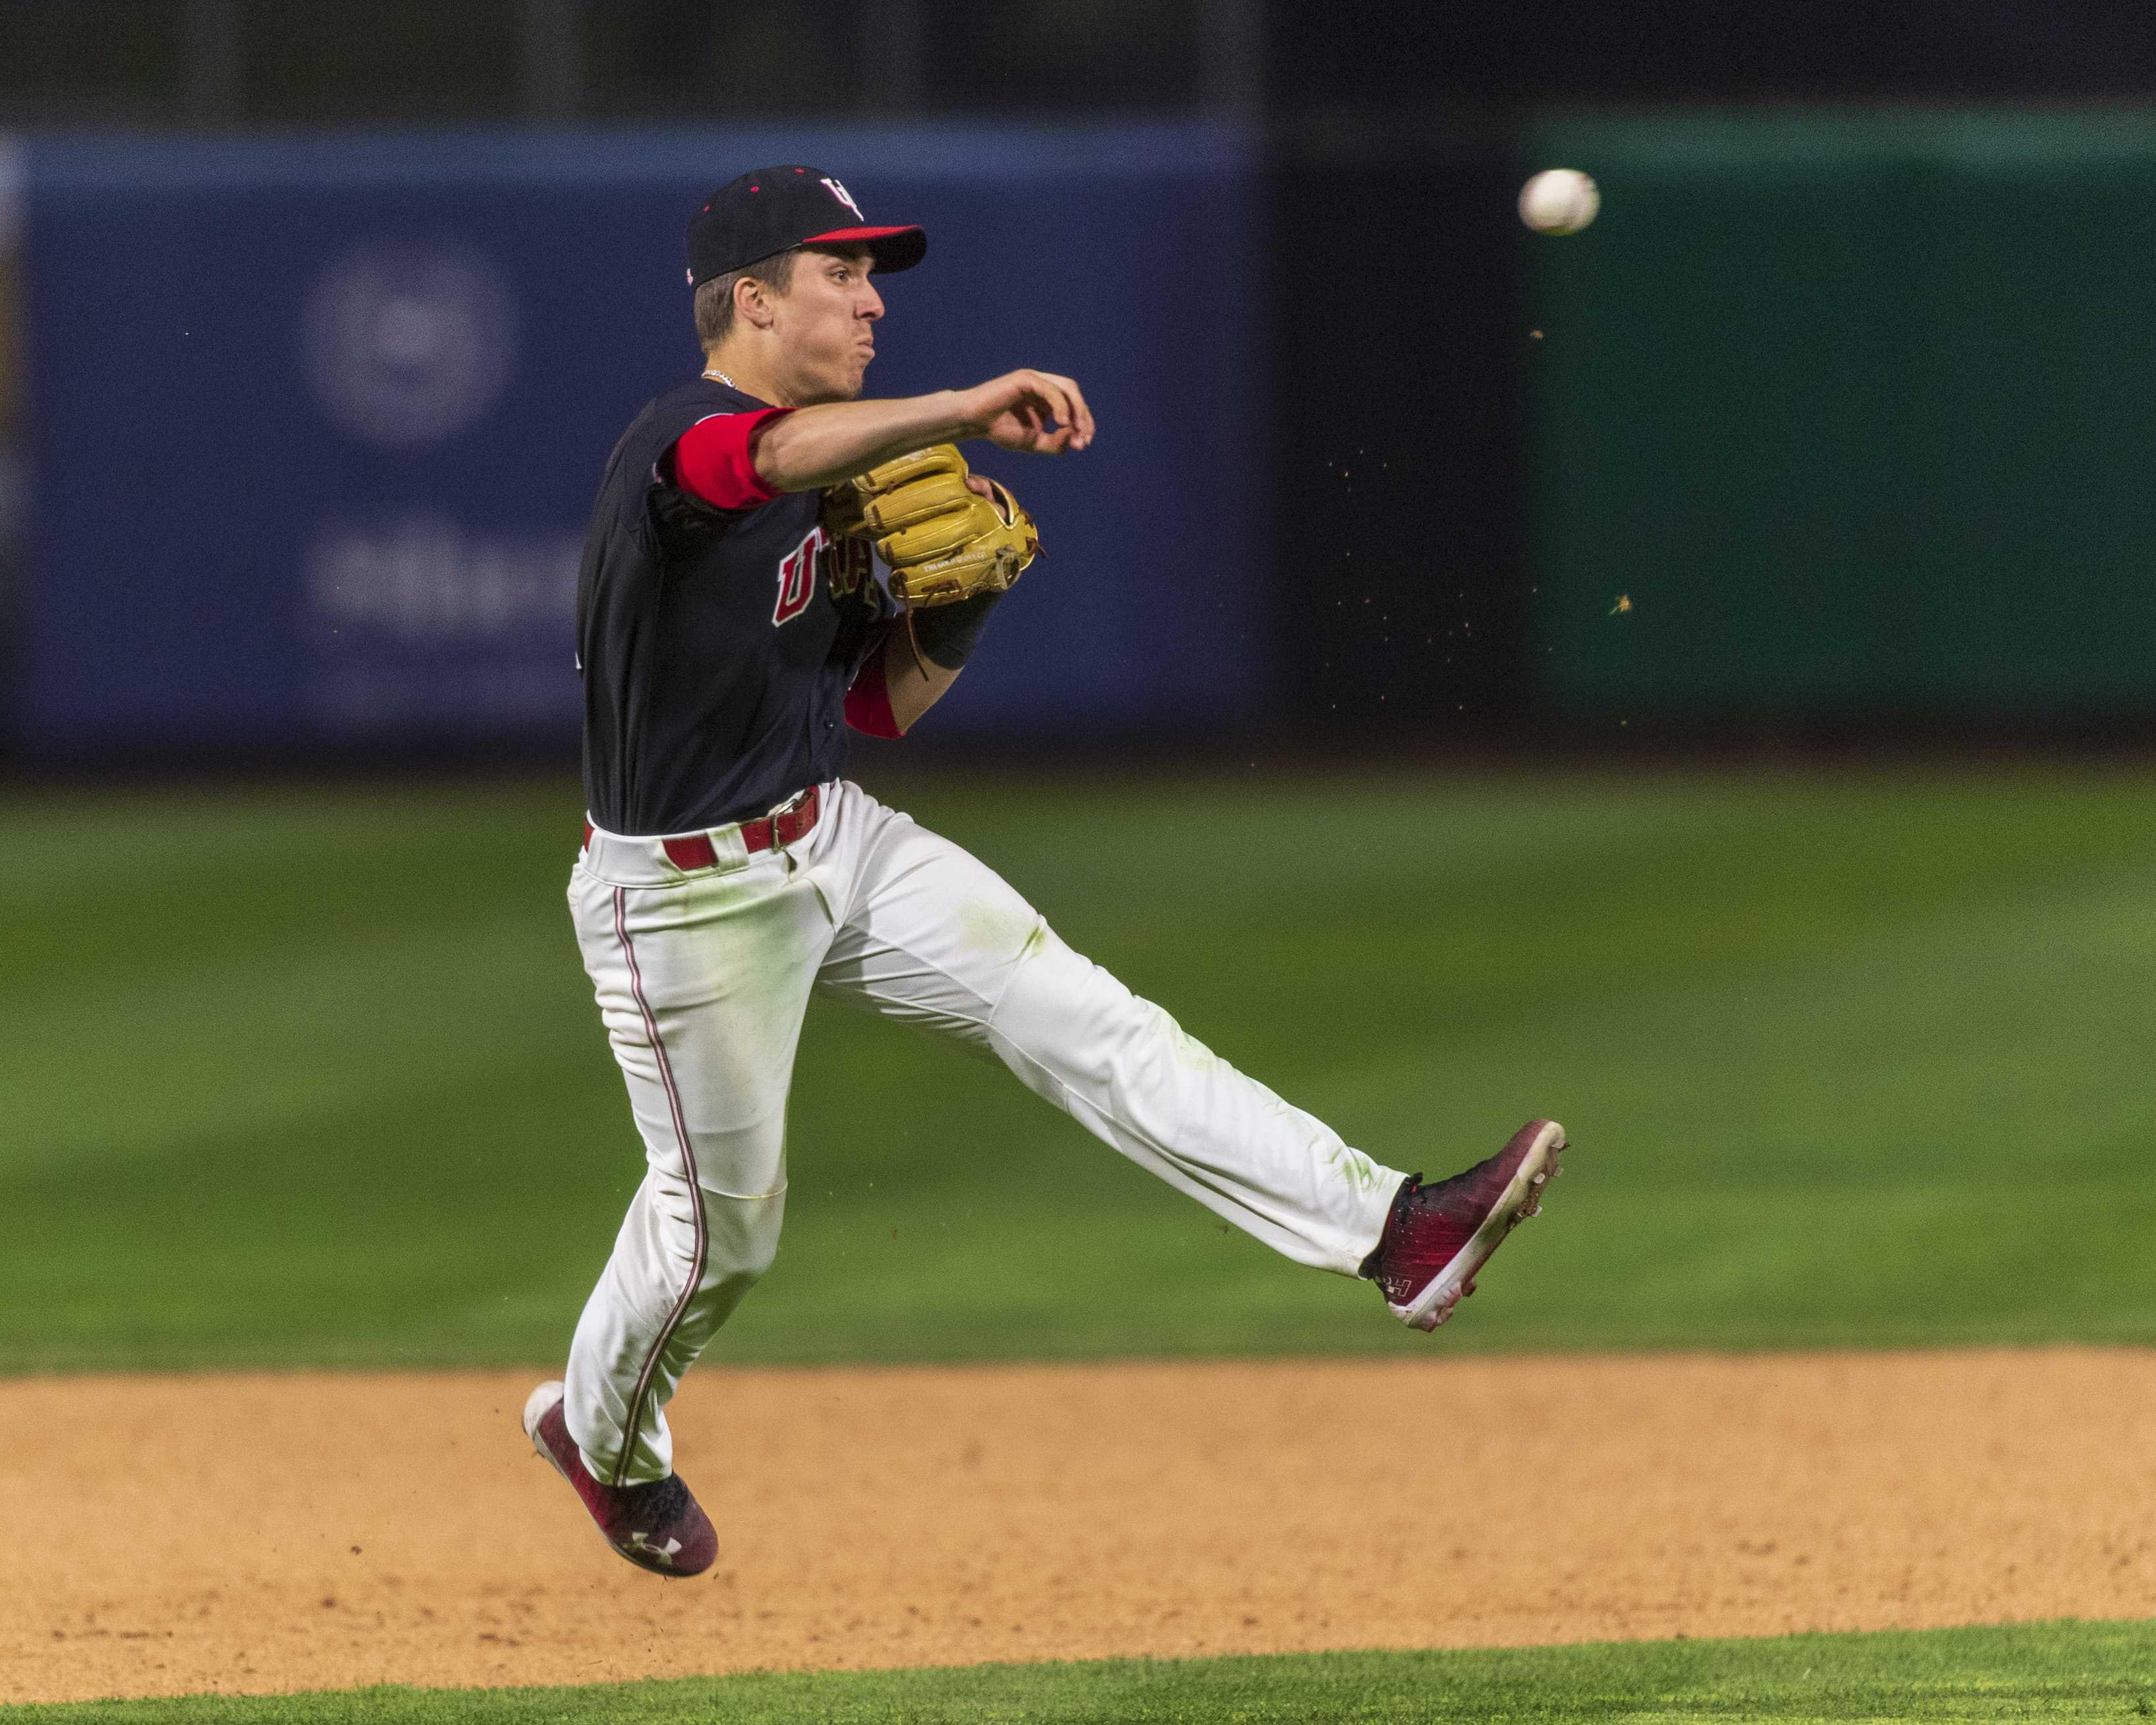 University of Utah sophomore infielder Matt Richardson (4) throws to first during an NCAA Baseball game at the Smith's Ballpark in Salt Lake City, Utah on Thursday, April 11, 2019. (Photo by Kiffer Creveling   The Daily Utah Chronicle)